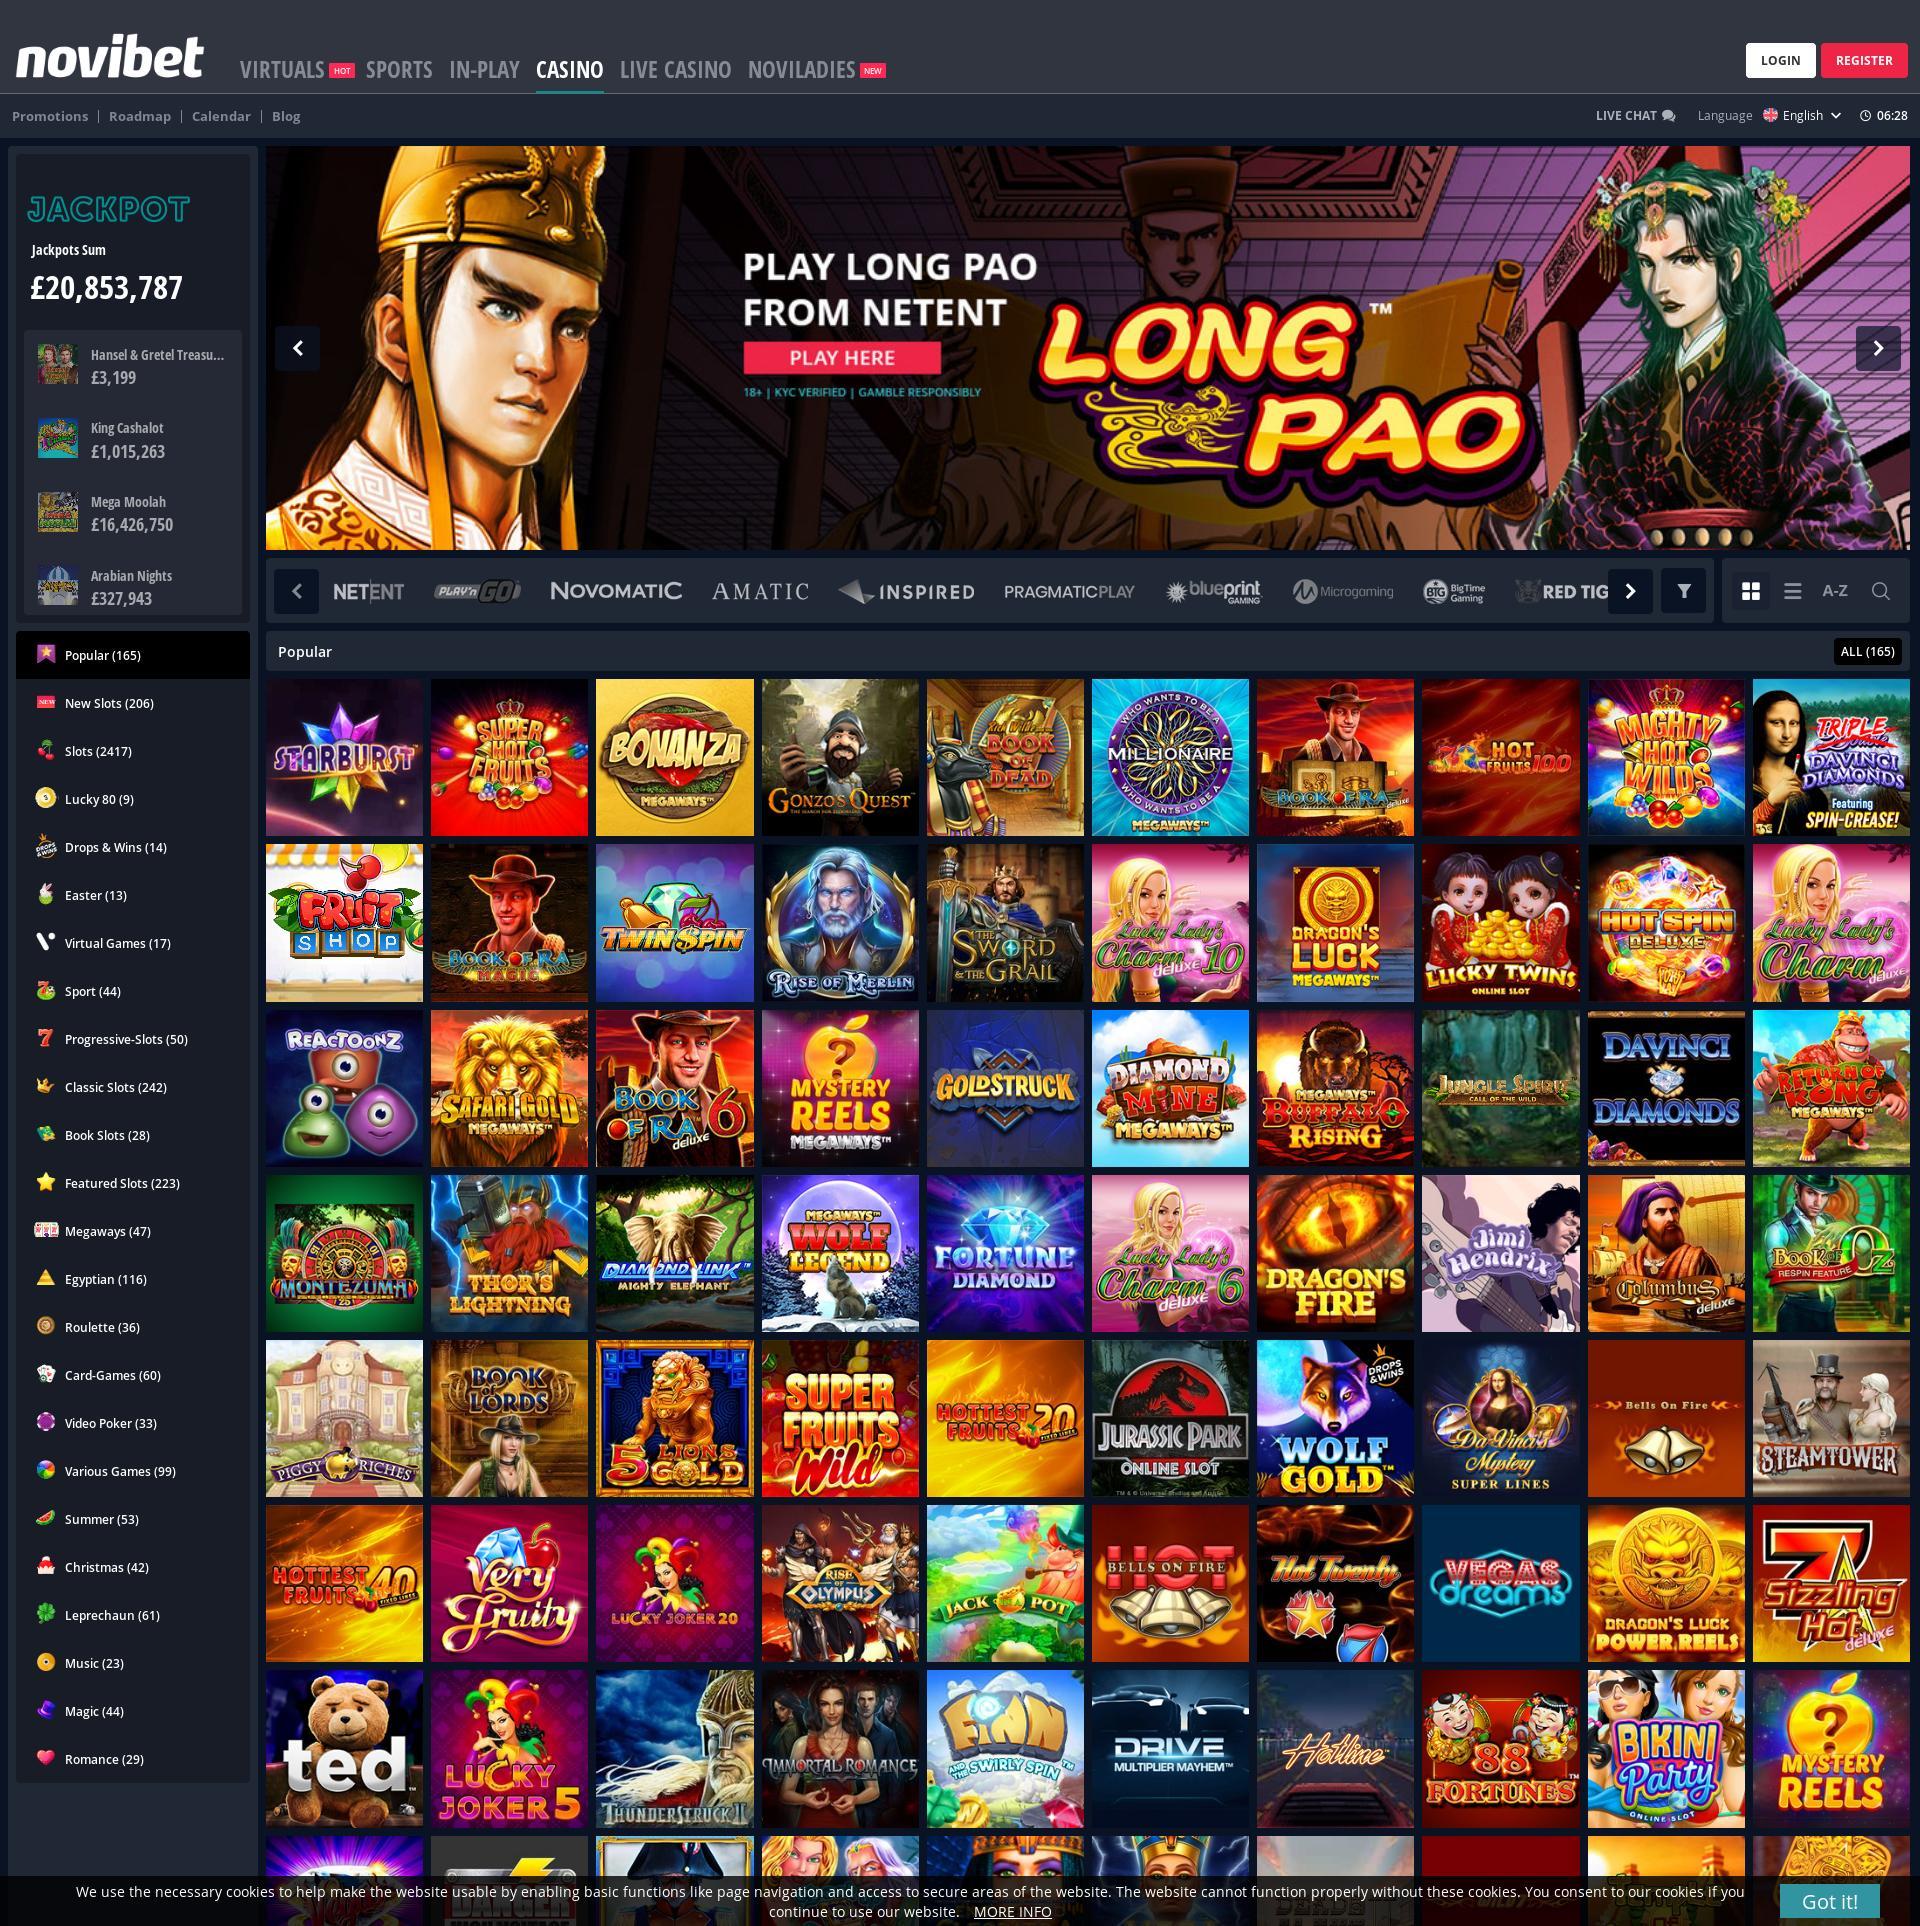 Bgo vegas casino roulette auszahlungen 0030661749